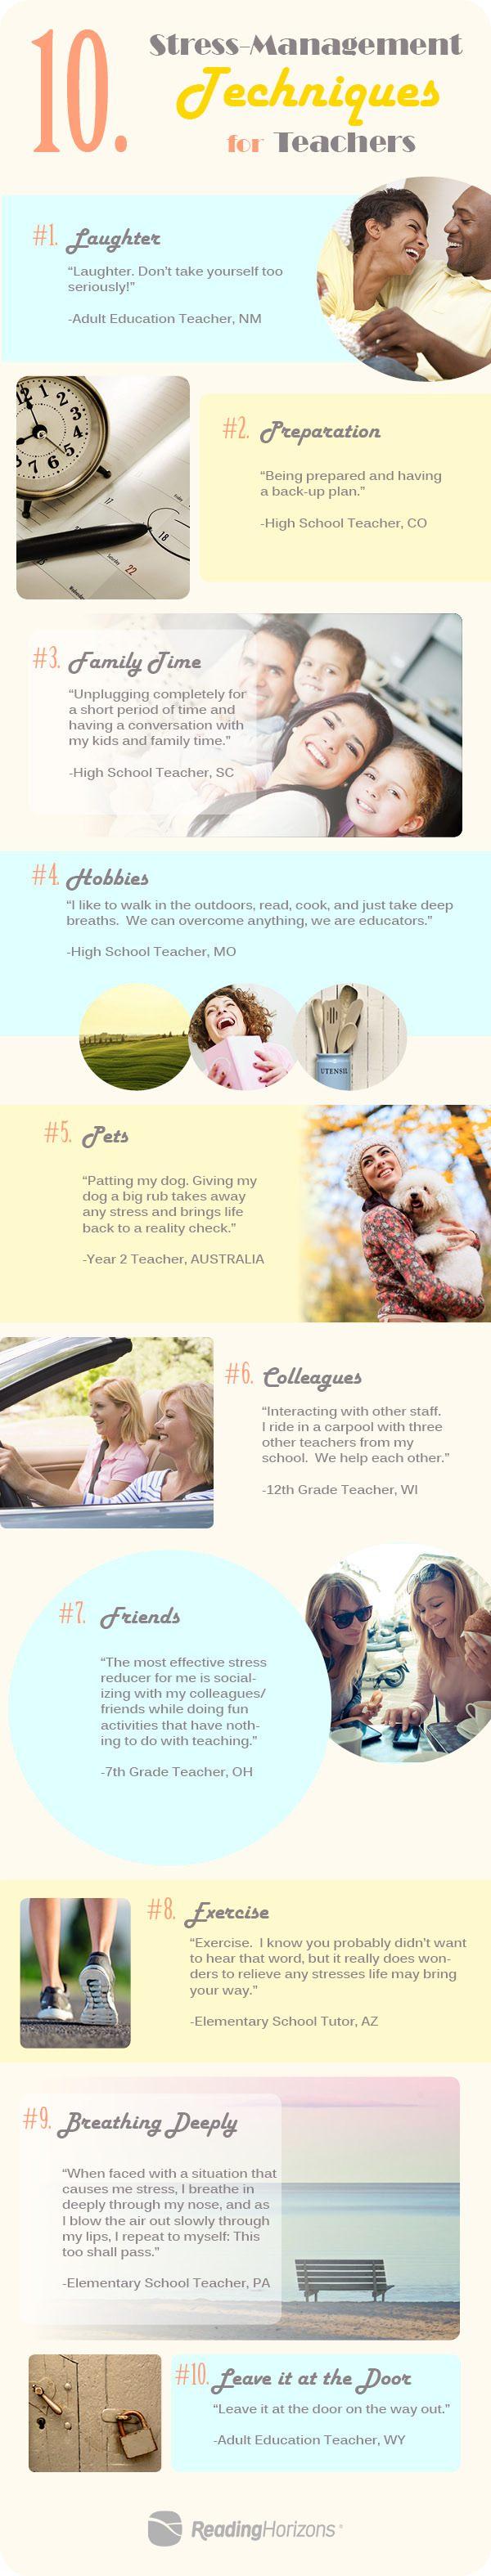 stress management techniques for teachers infographic e  10 stress management techniques for teachers infographic